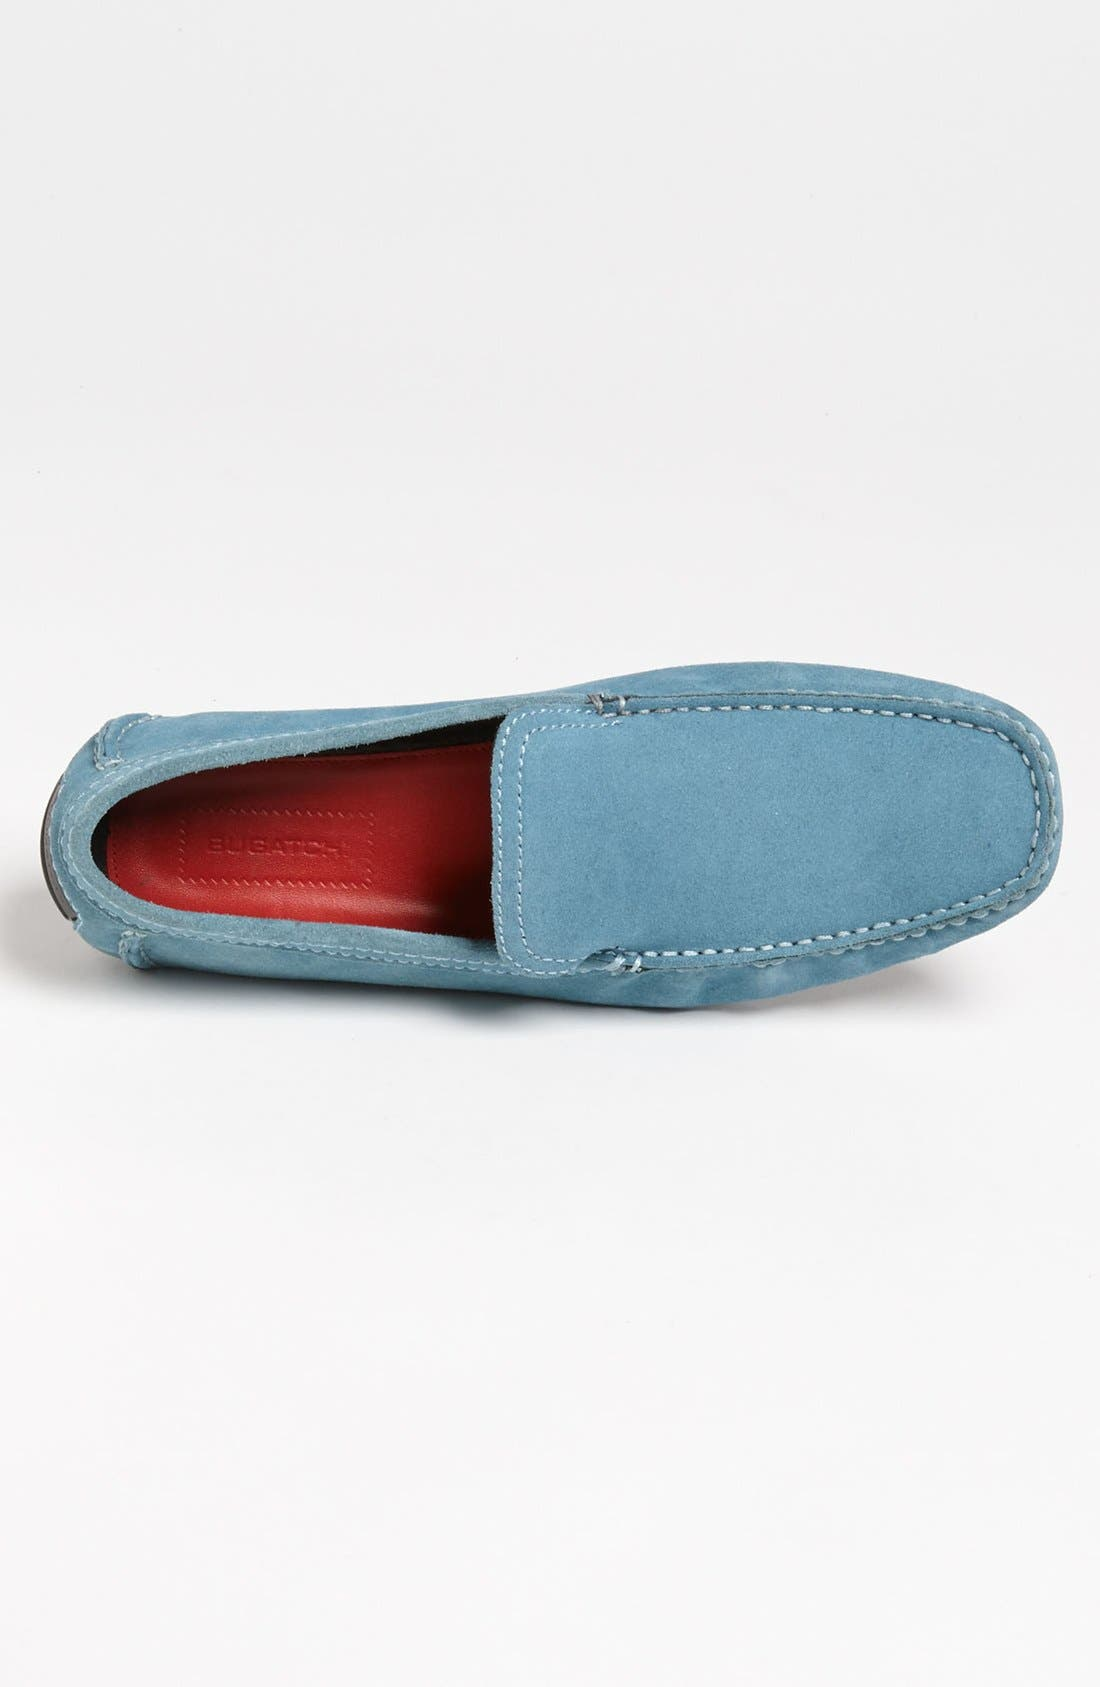 Alternate Image 3  - Bugatchi 'Picasso' Driving Shoe